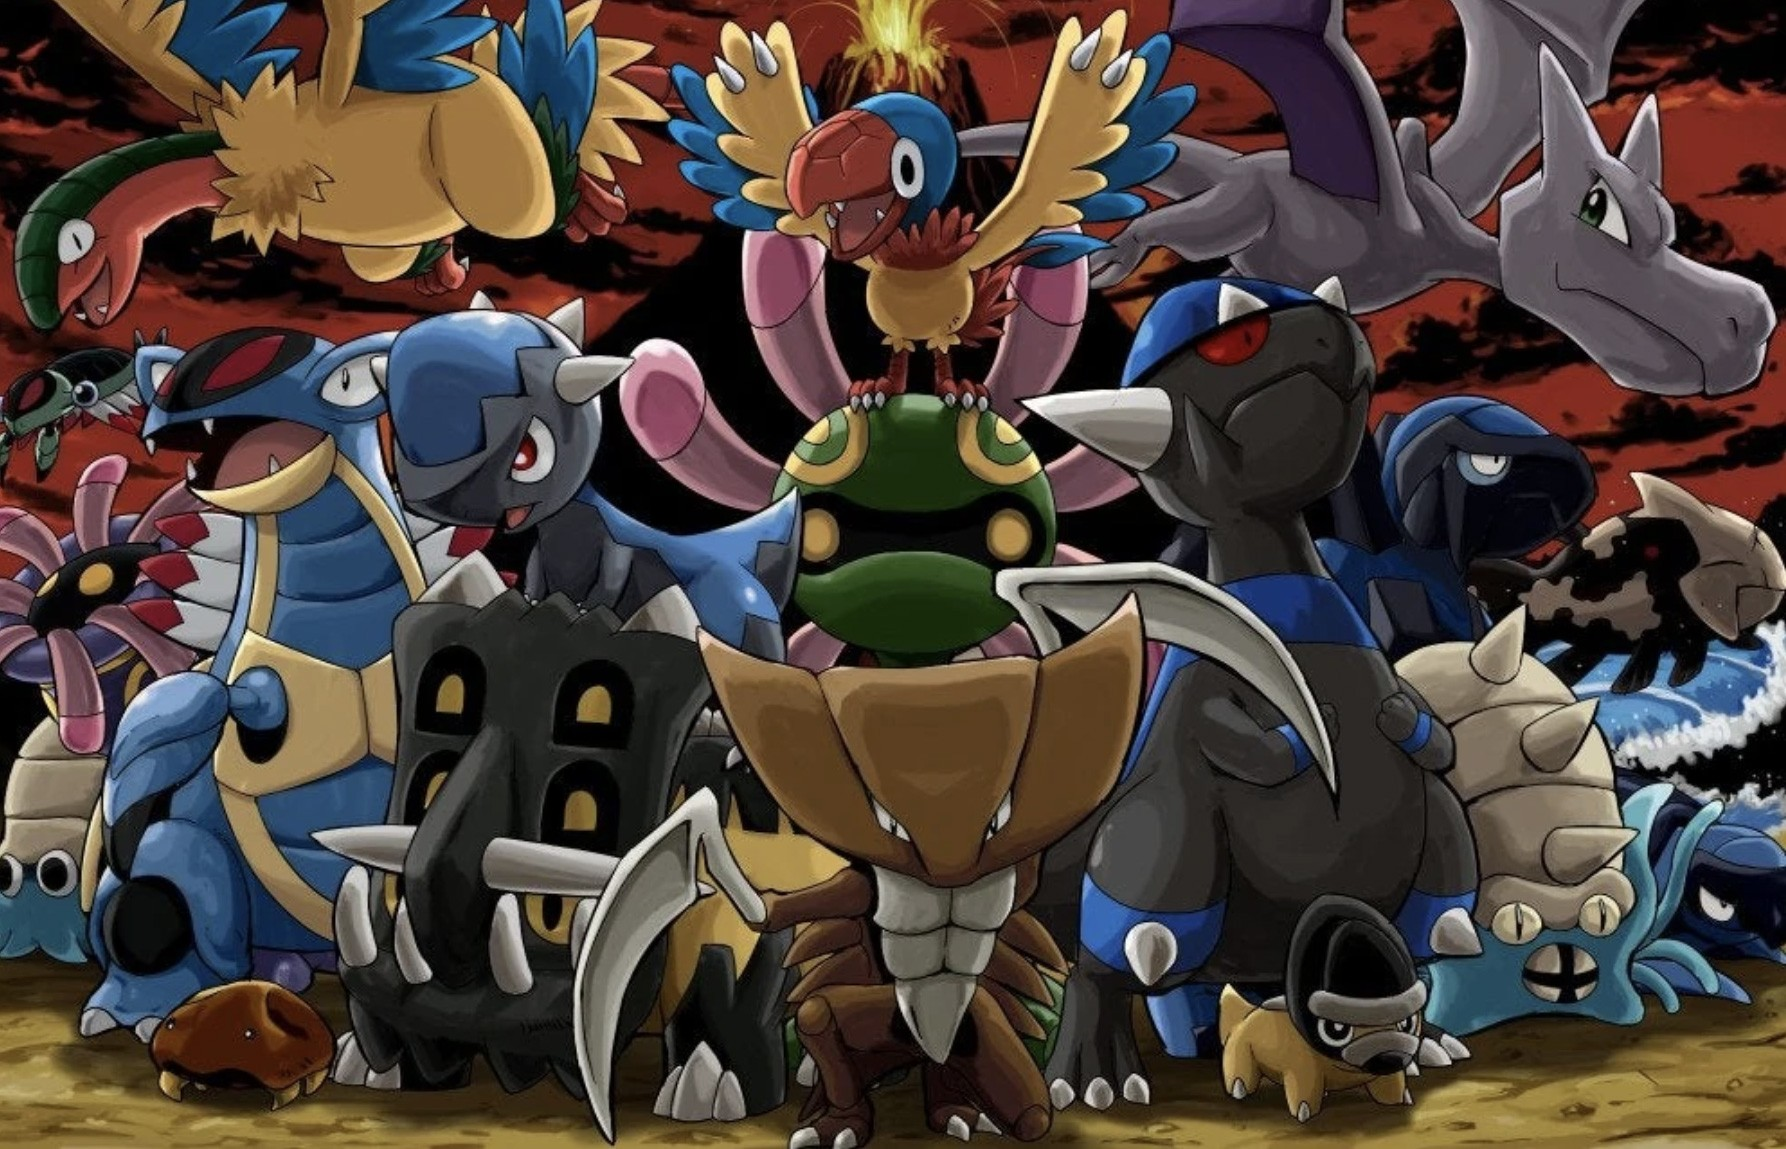 A Tokyo ci sarà una mostra di fossili Pokémon